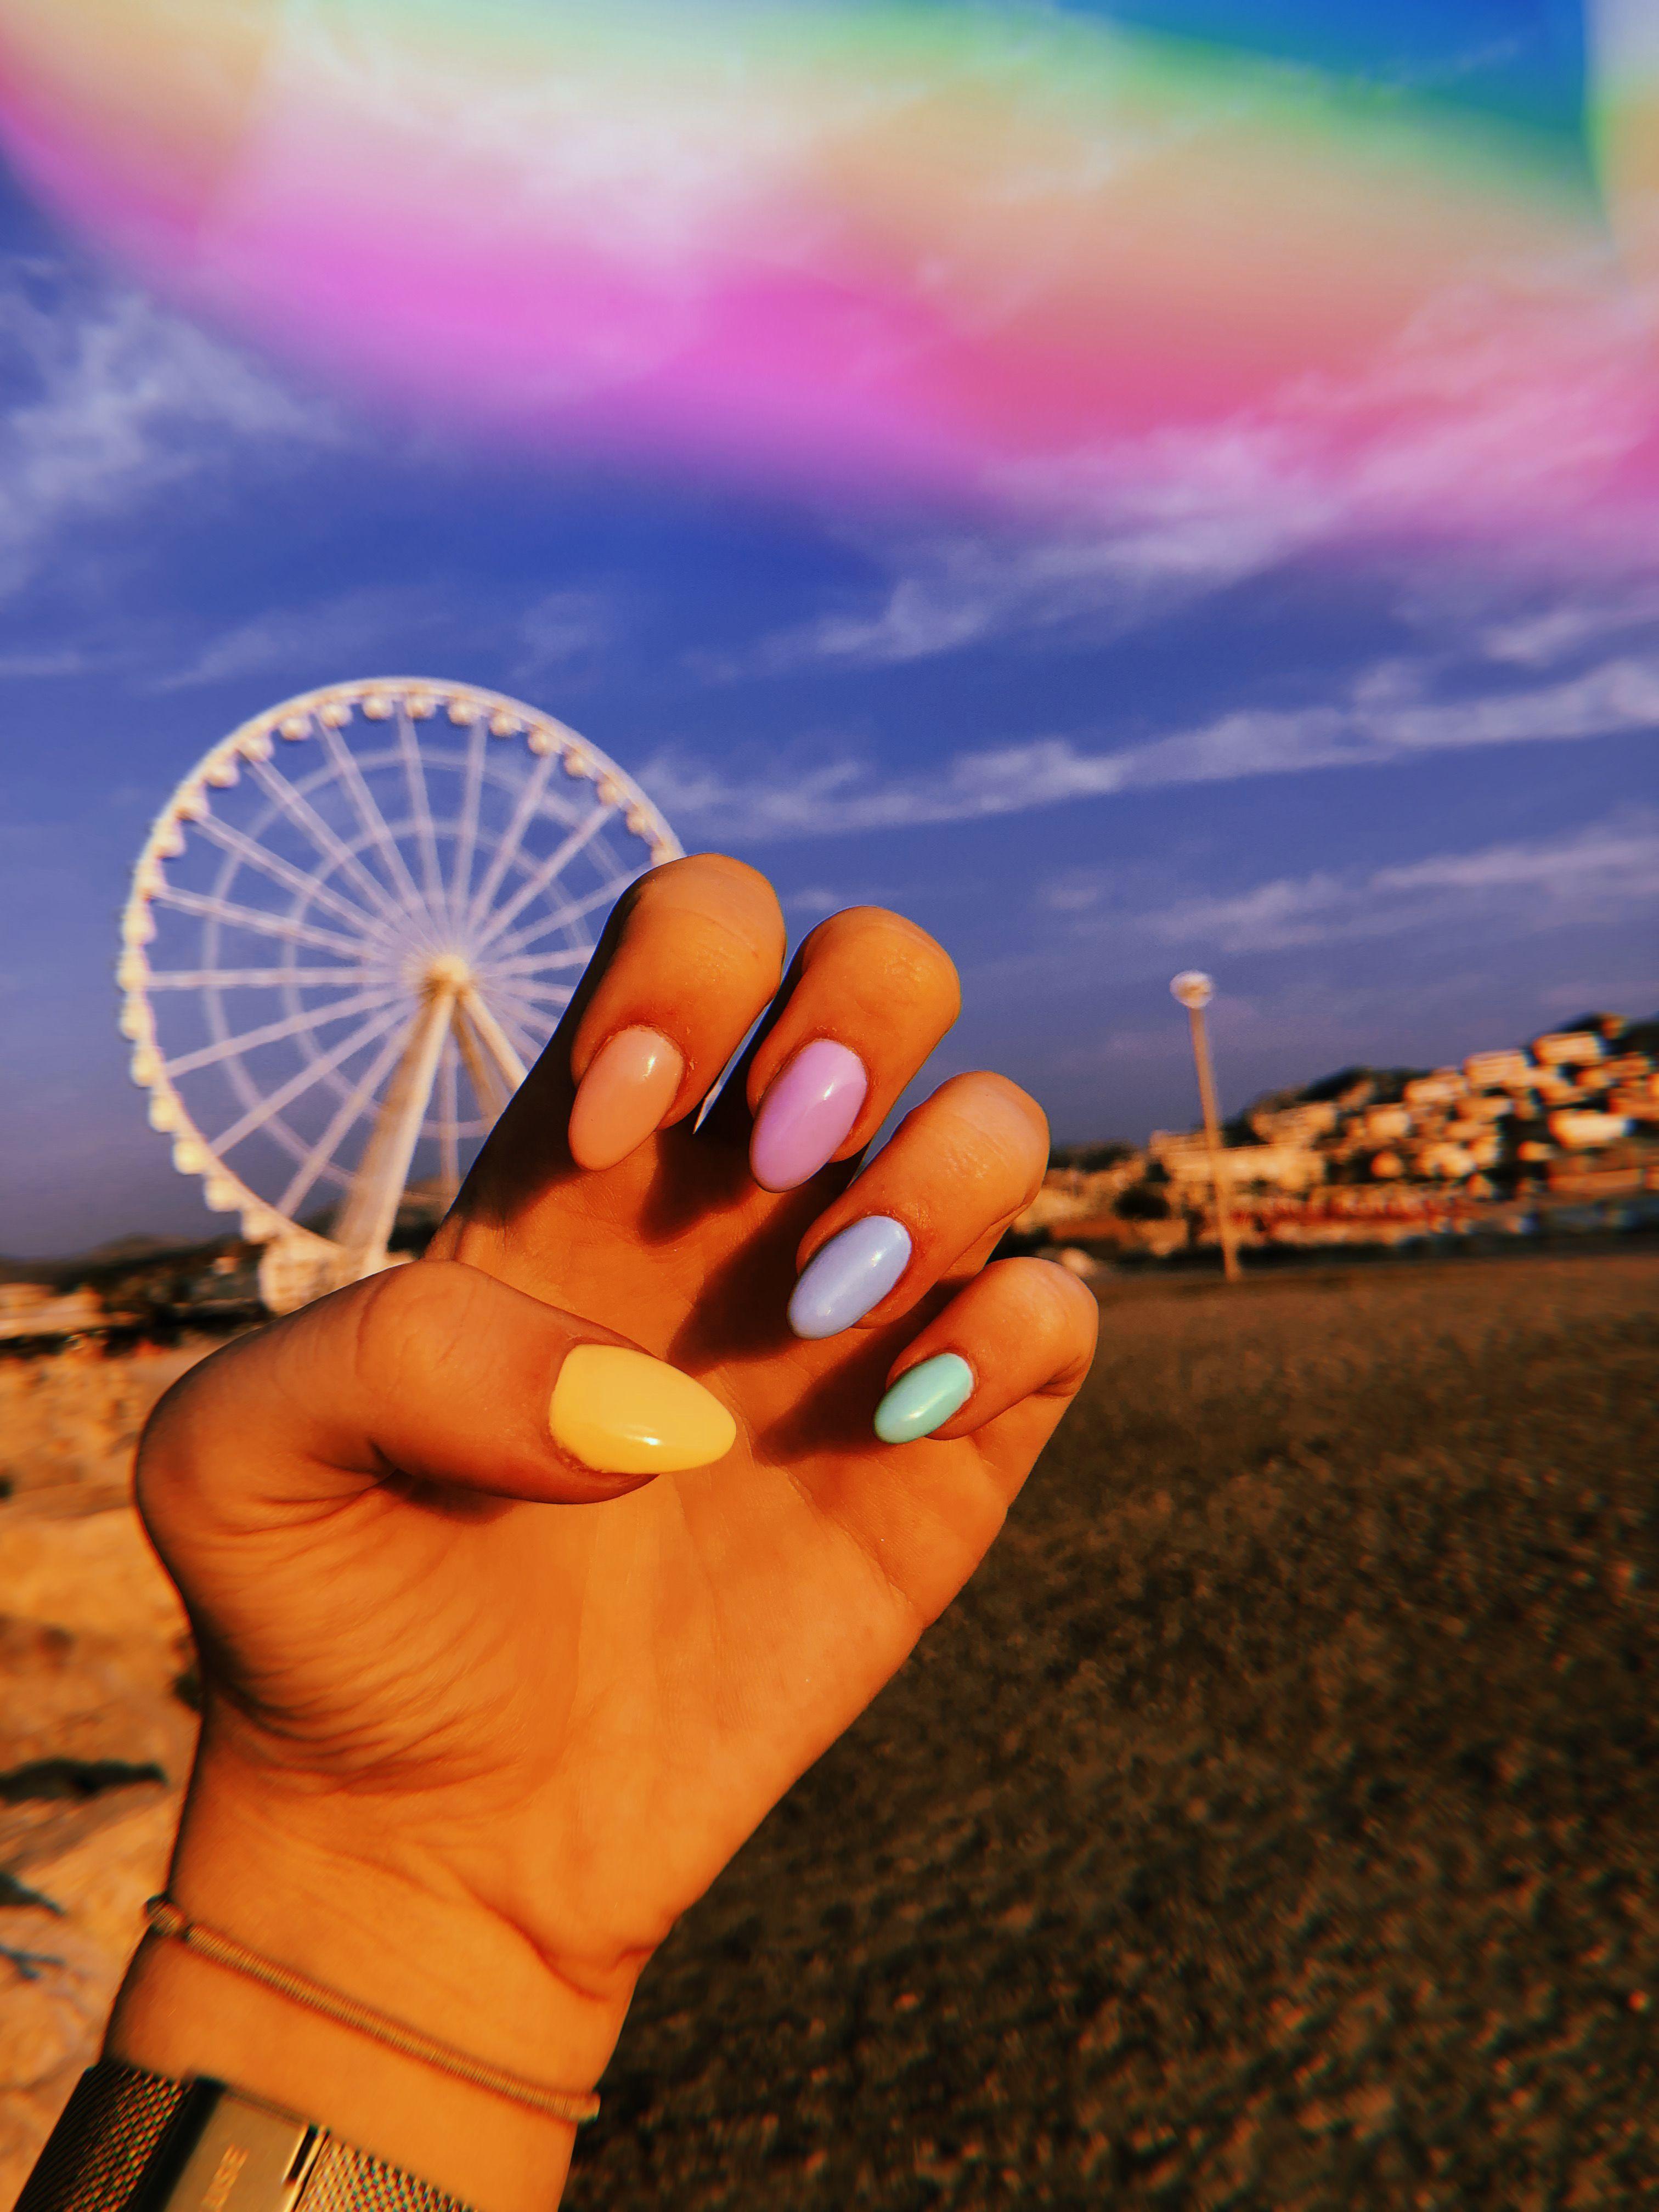 Pastel Rainbow Nails Vsco Girl Huji Summer Hand Beach Rainbow Nails Short Acrylic Nails Pastel Rainbow